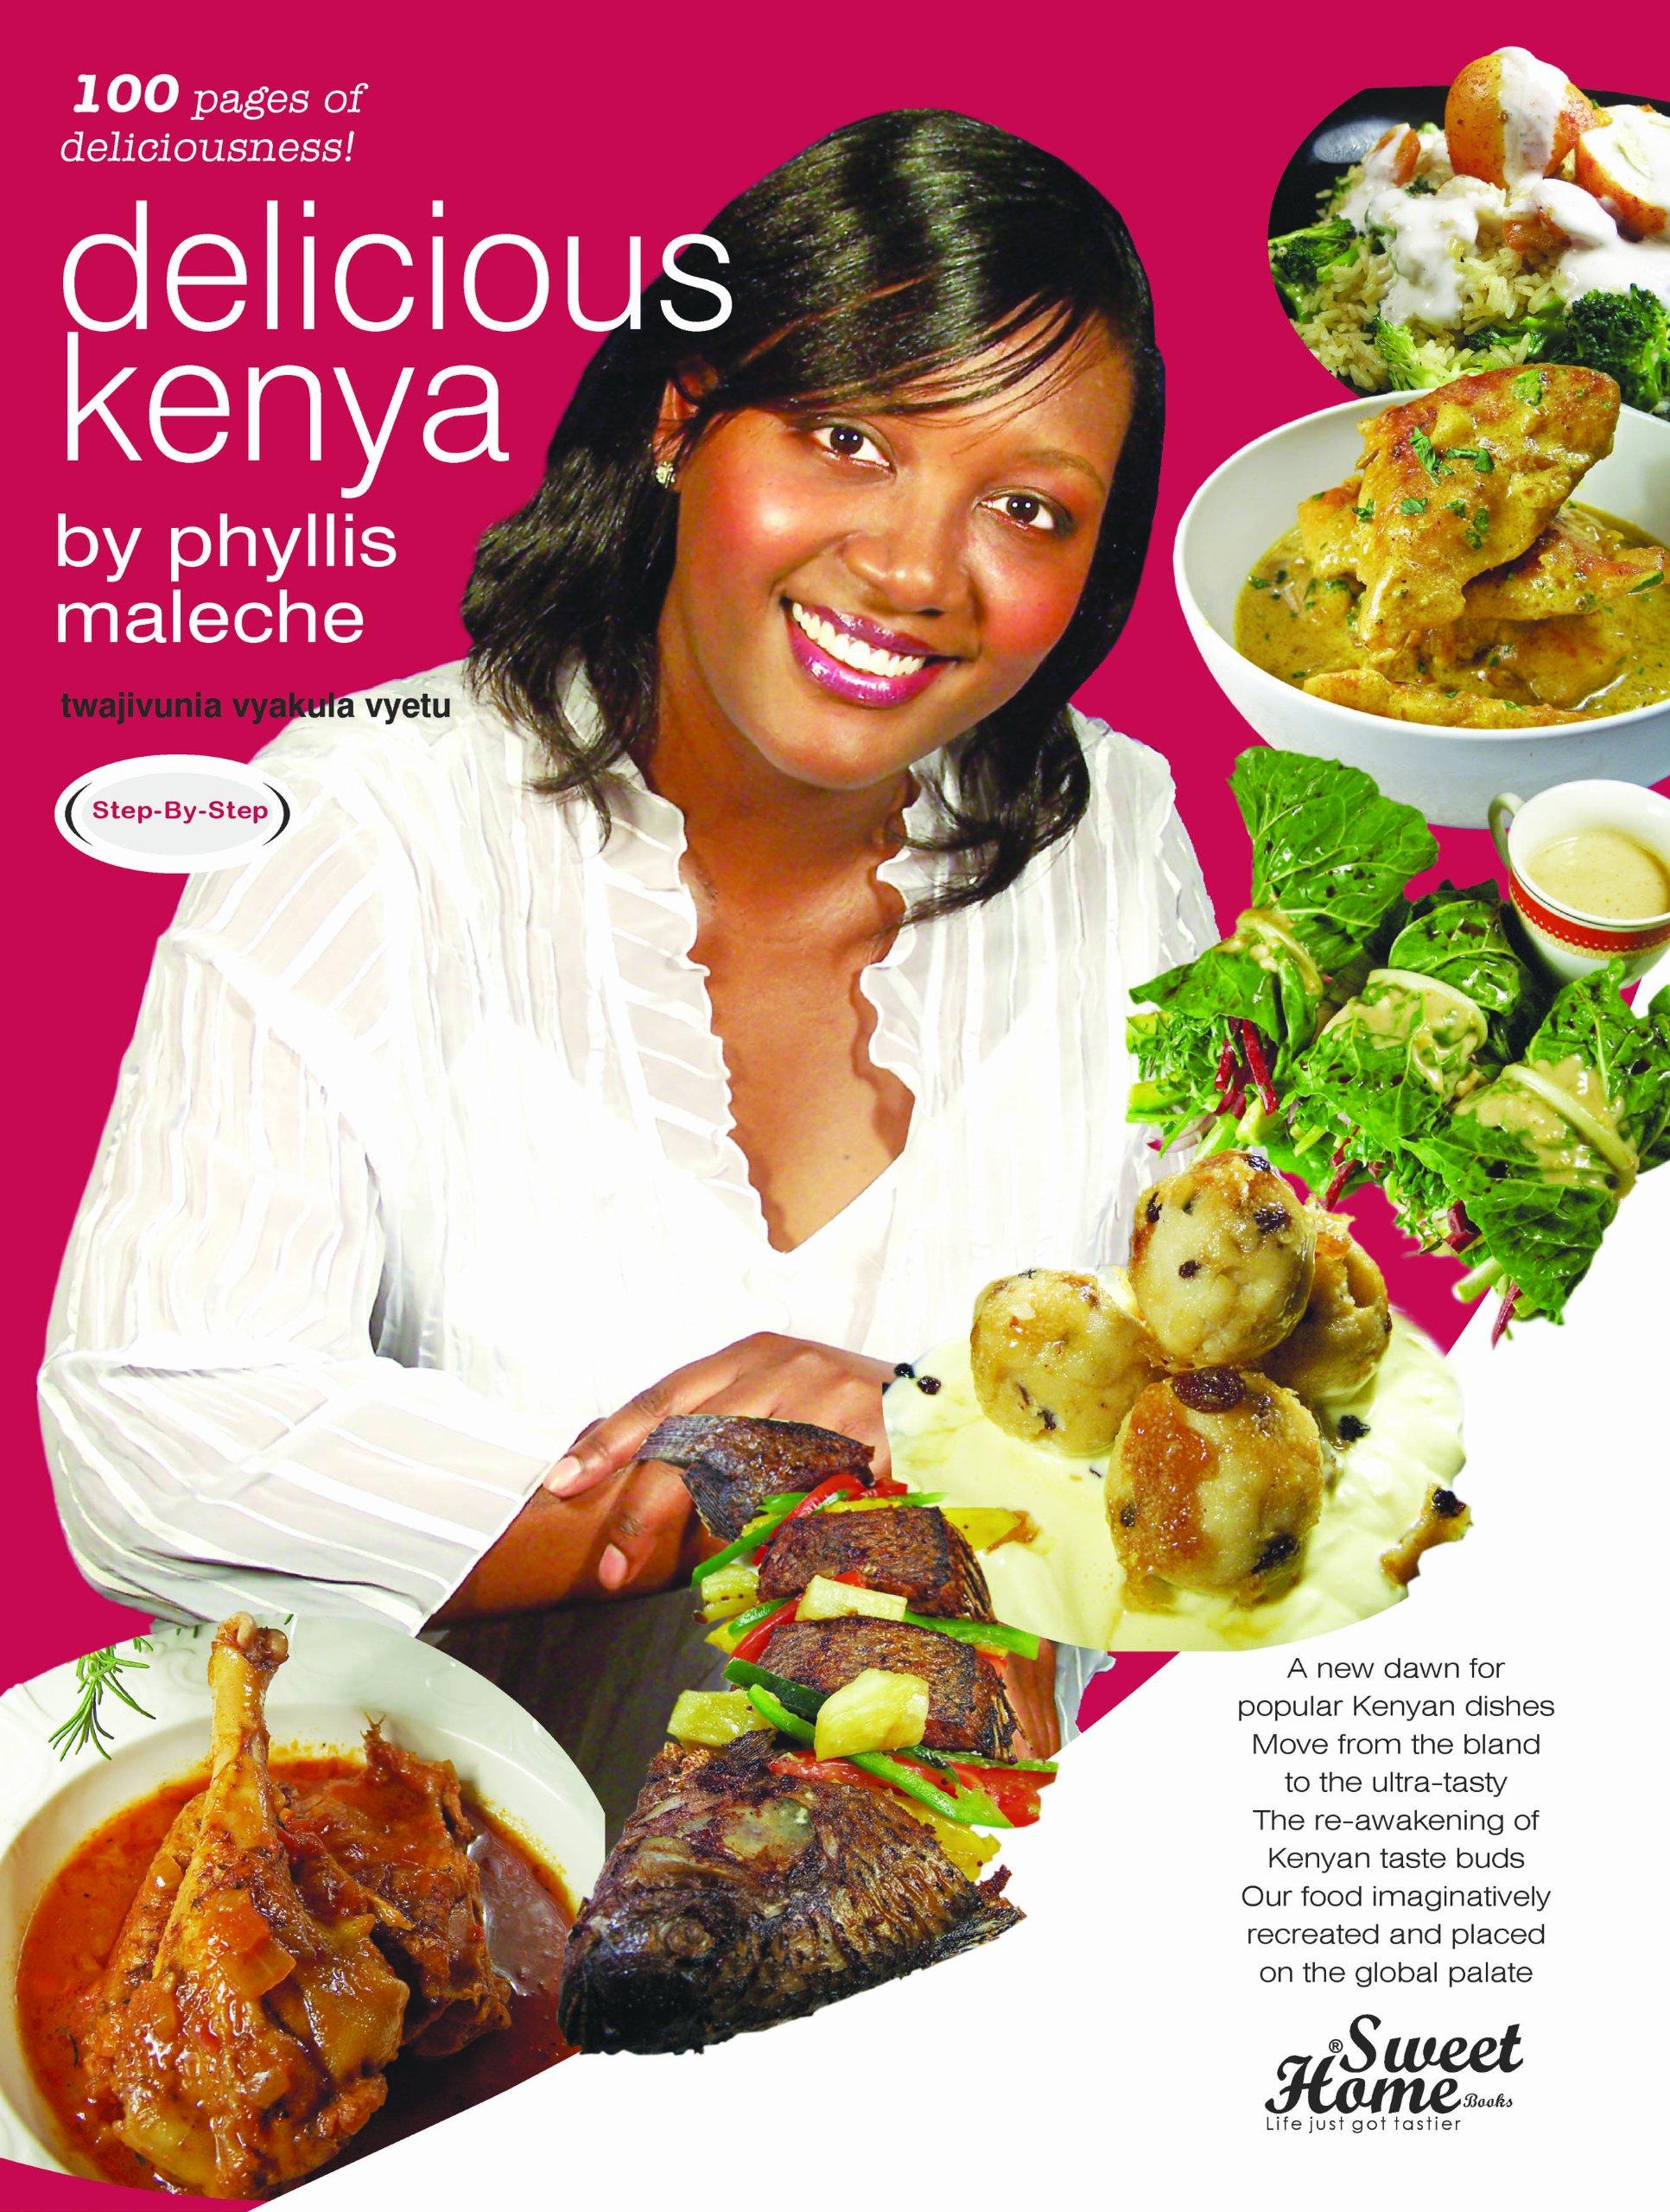 Delicious kenya cookbook 1 phyllis maleche 9789966160607 amazon delicious kenya cookbook 1 phyllis maleche 9789966160607 amazon books forumfinder Choice Image